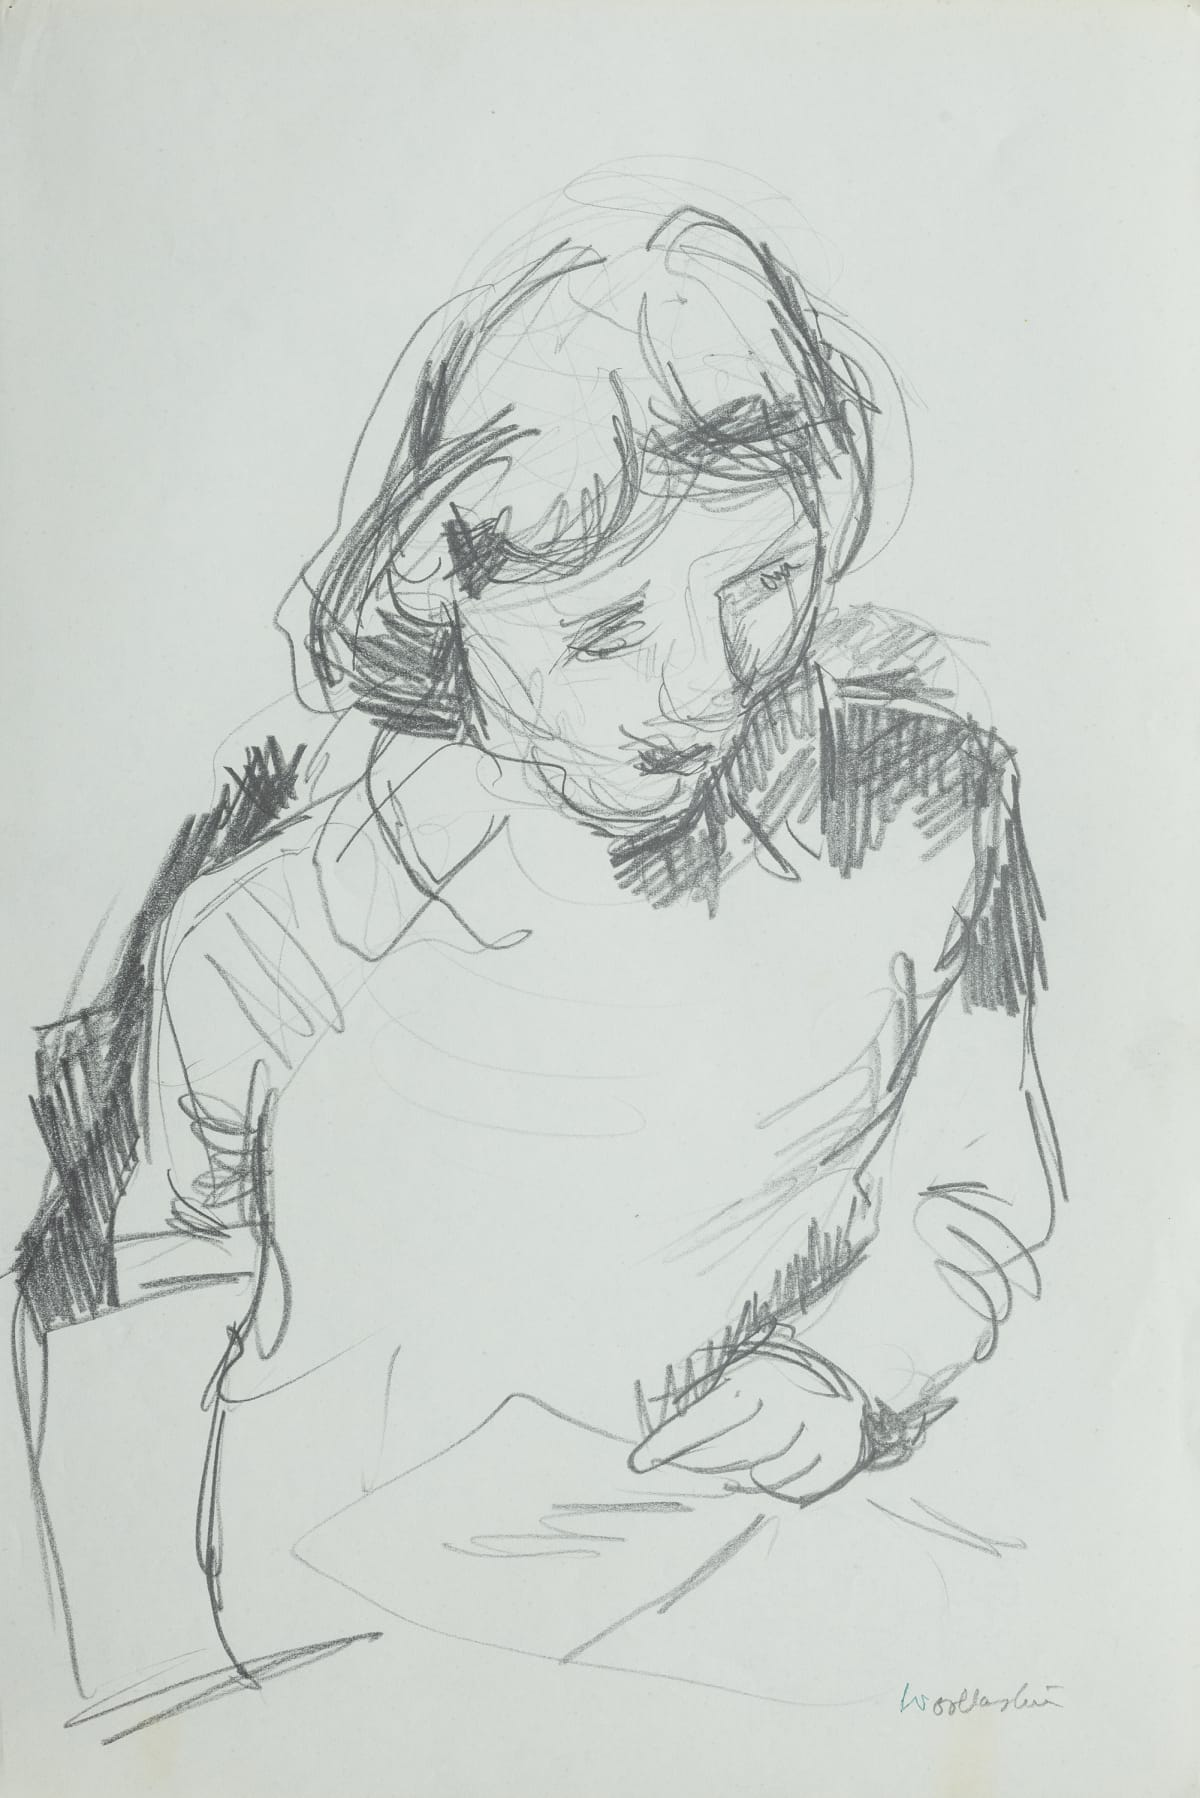 Mountford Tosswill Woollaston Female Figure - Upper Half, ND pencil on paper 375mm x 250mm